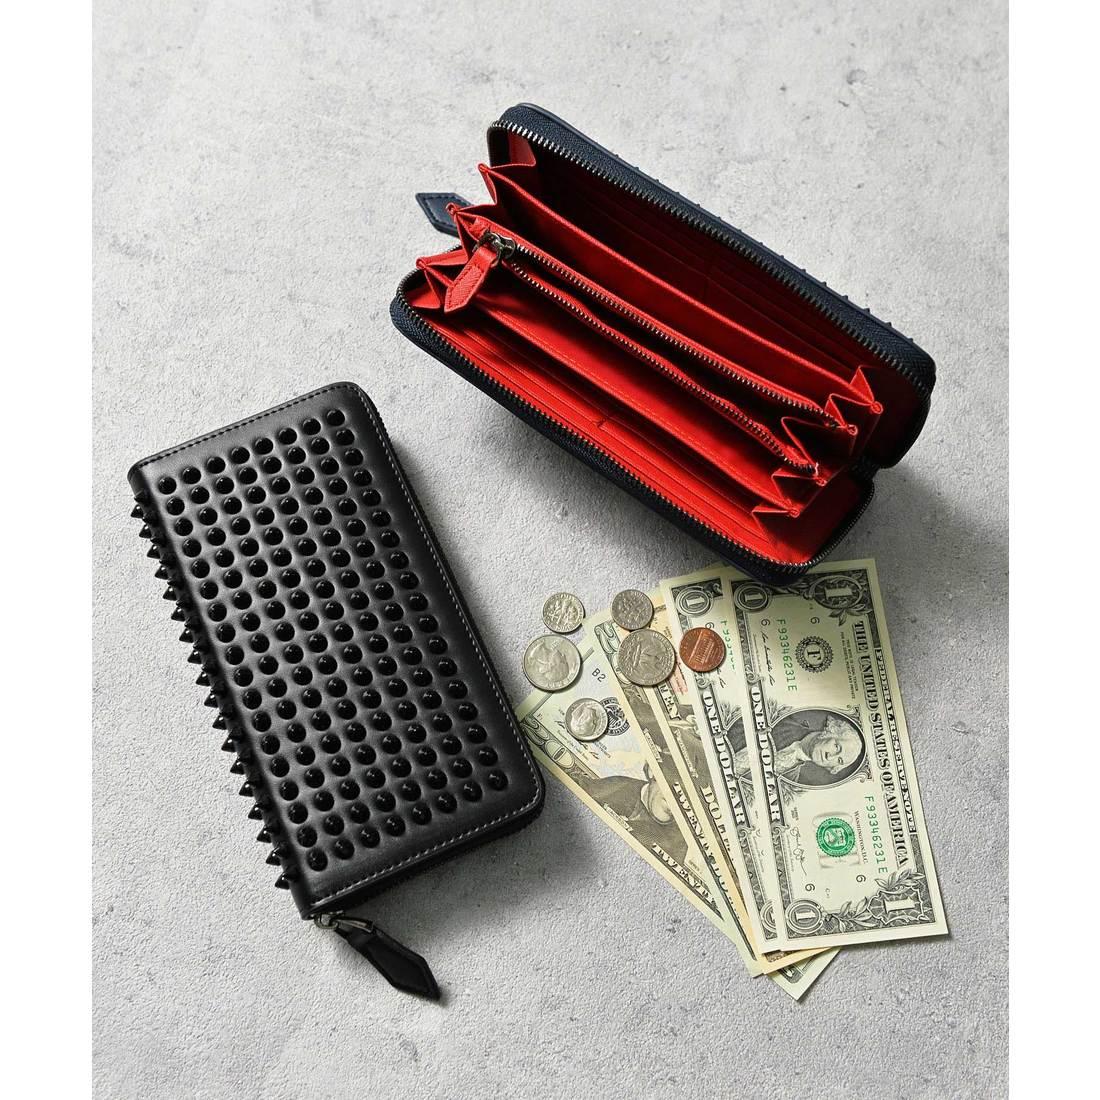 fcf9f2bfb281 アッド Add+ 本革スタッズ長財布 ラウンドジップロングウォレット (ブラック) -靴&ファッション通販 ロコンド〜自宅で試着、気軽に返品